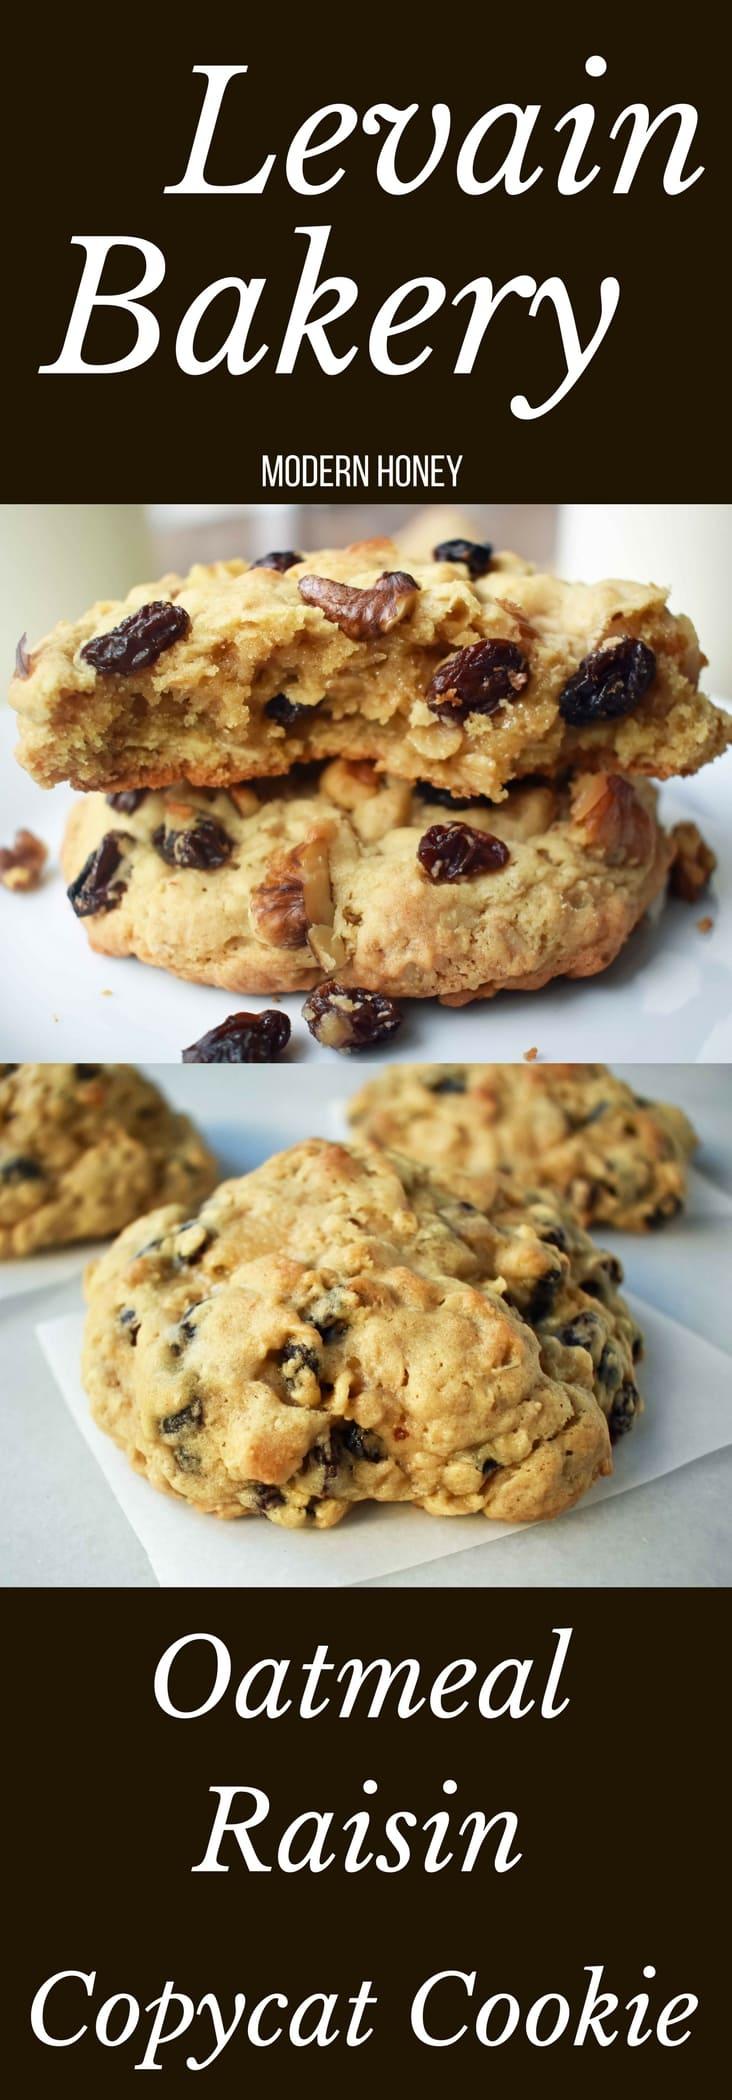 Levain Bakery Oatmeal Raisin Cookies Modern Honey